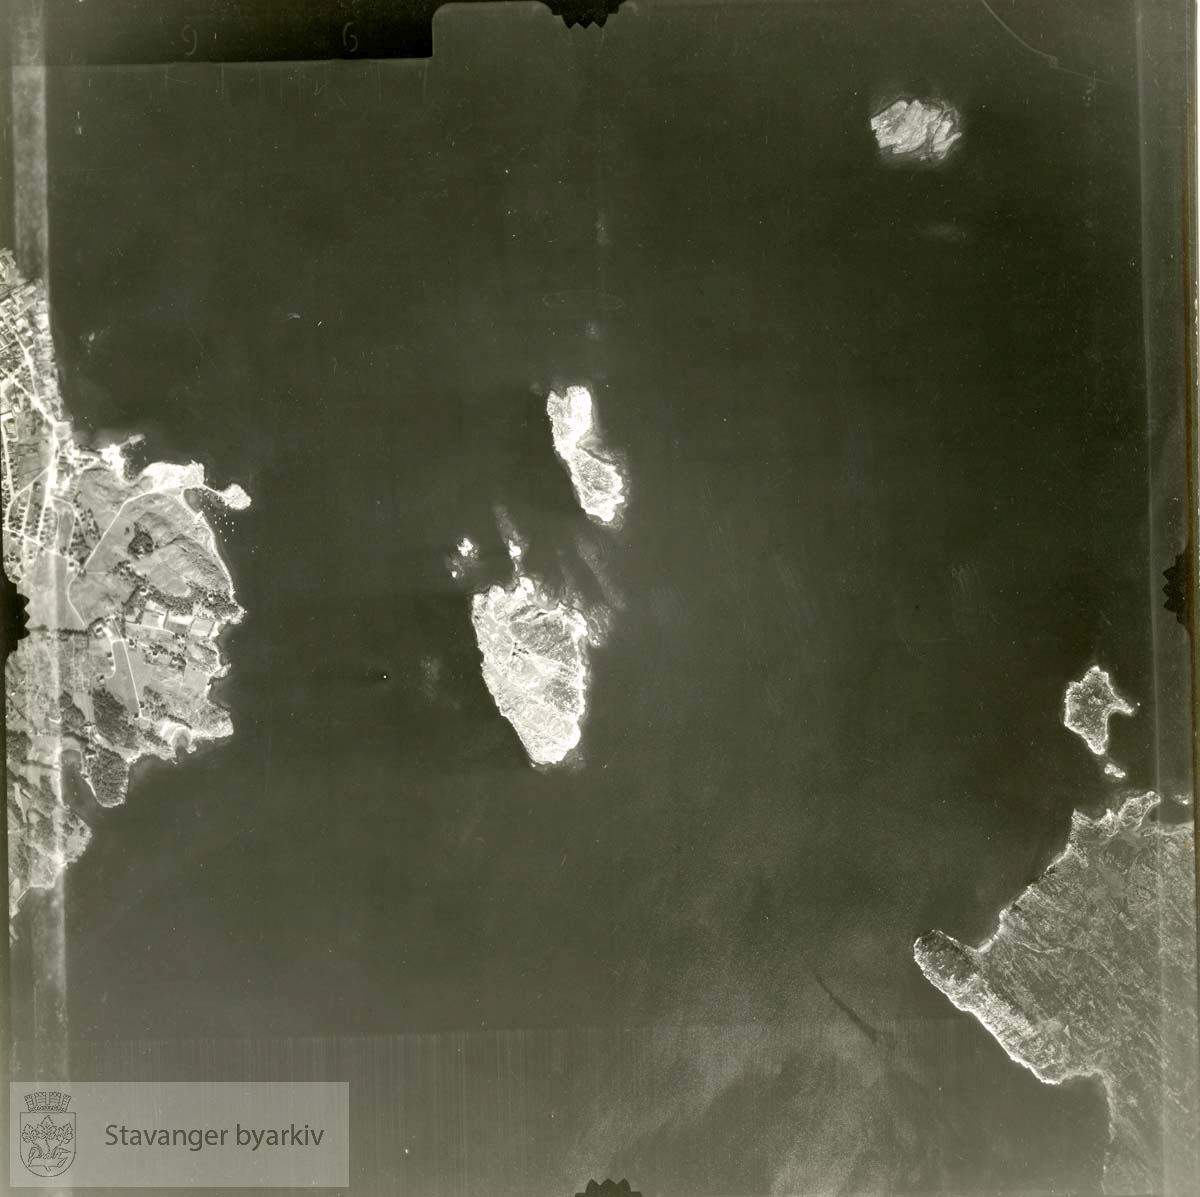 Jfr. kart/fotoplan G26/596..Usken, Marøya, Breivik, Rosenli, Dreyersholmen, Lervik..Se ByStW_Uca_002 (kan lastes ned under fanen for kart på Stavangerbilder)